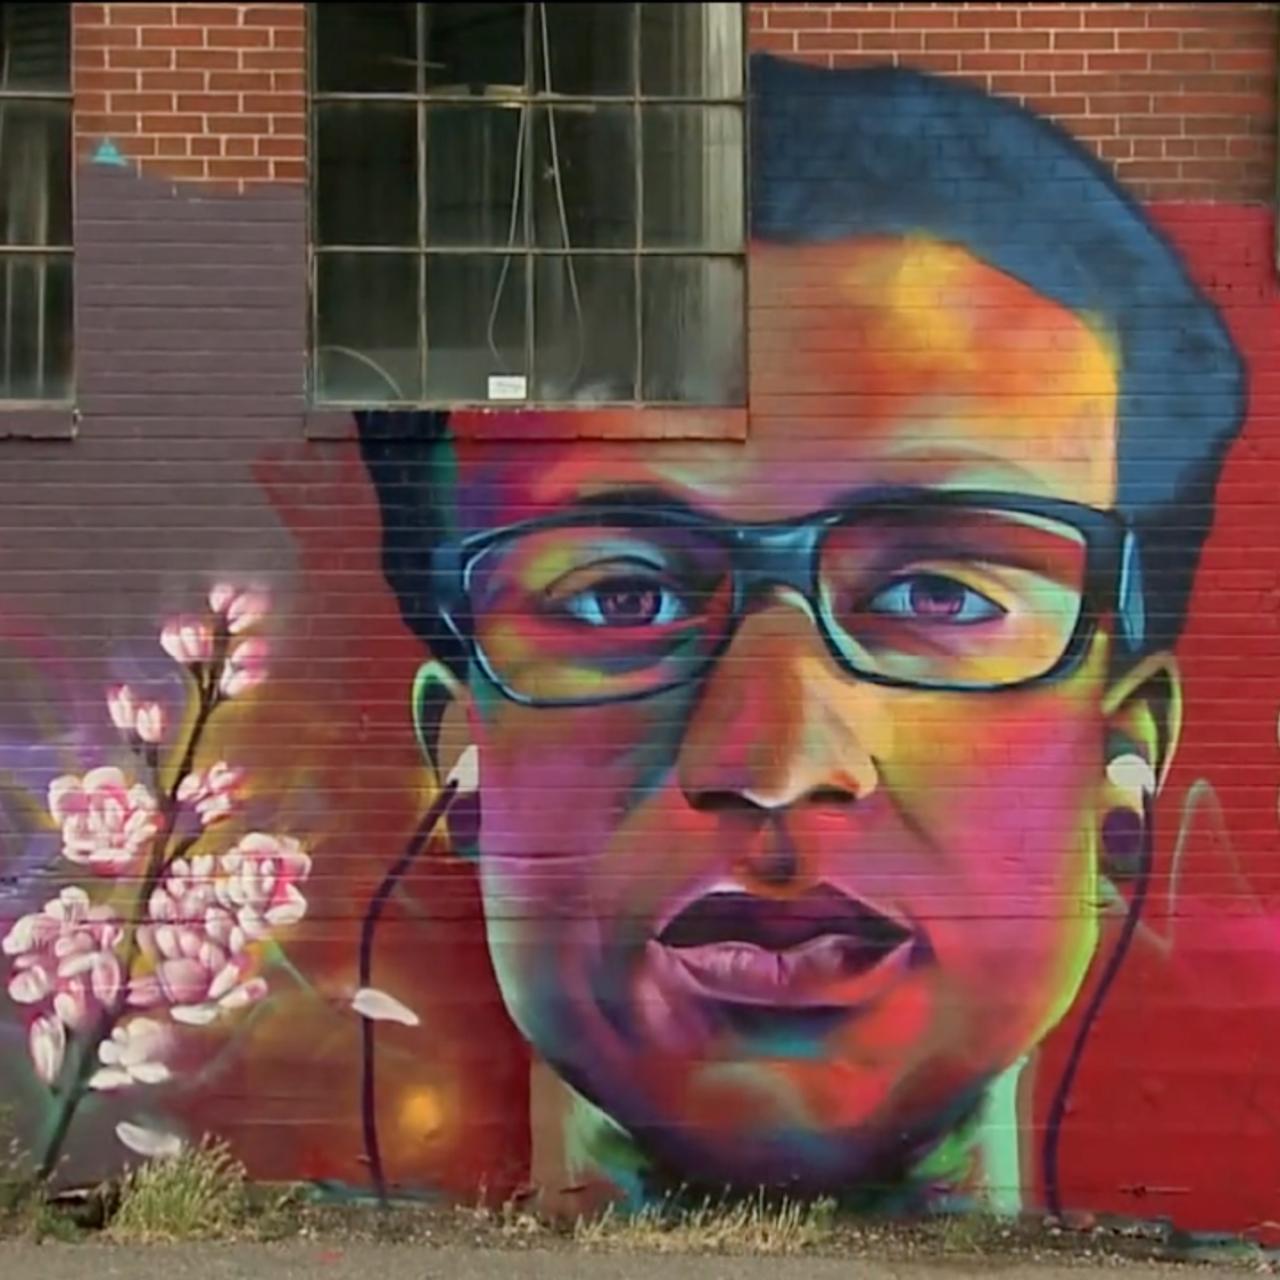 painting of Elijah McClain on brick wall